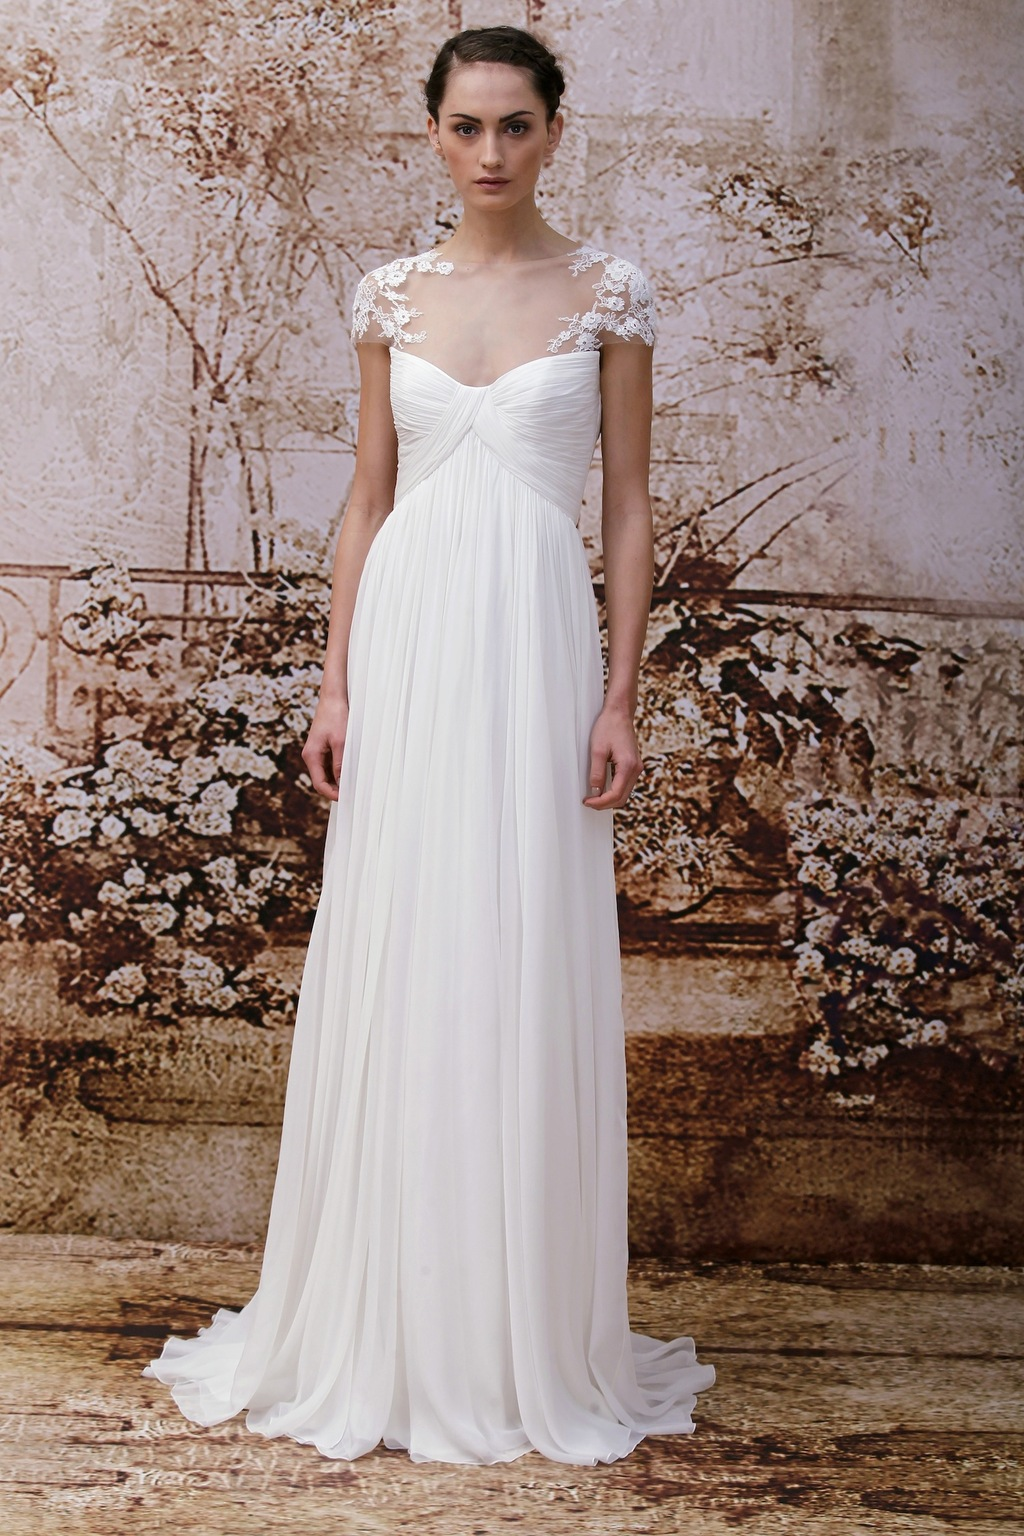 Wedding-dress-by-monique-lhuillier-fall-2014-bridal-look-10.full